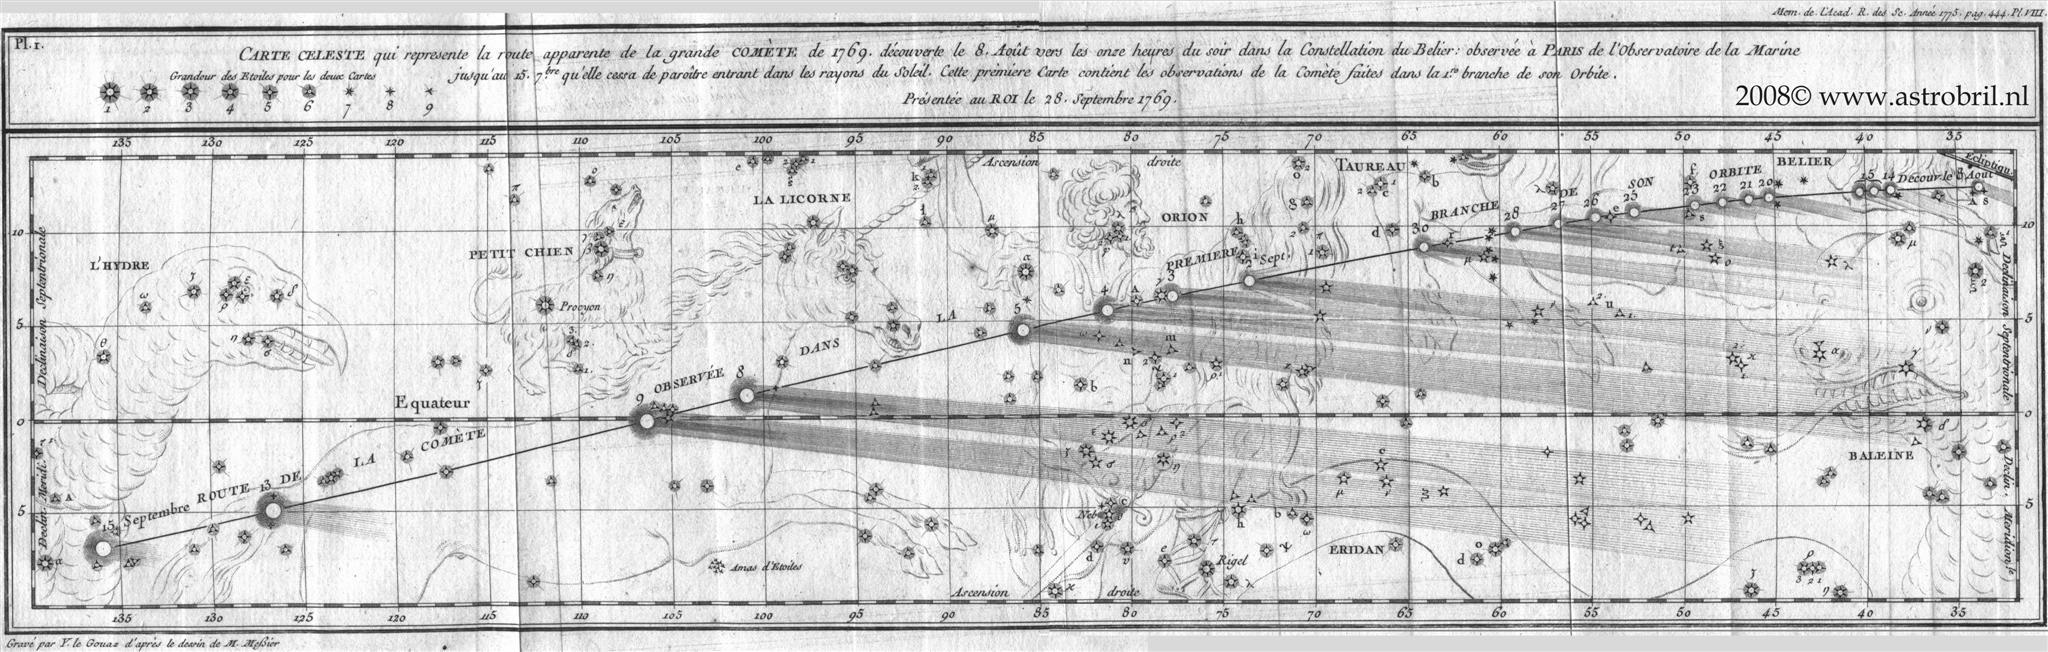 Comet C/1769 P1 (Messier) - I